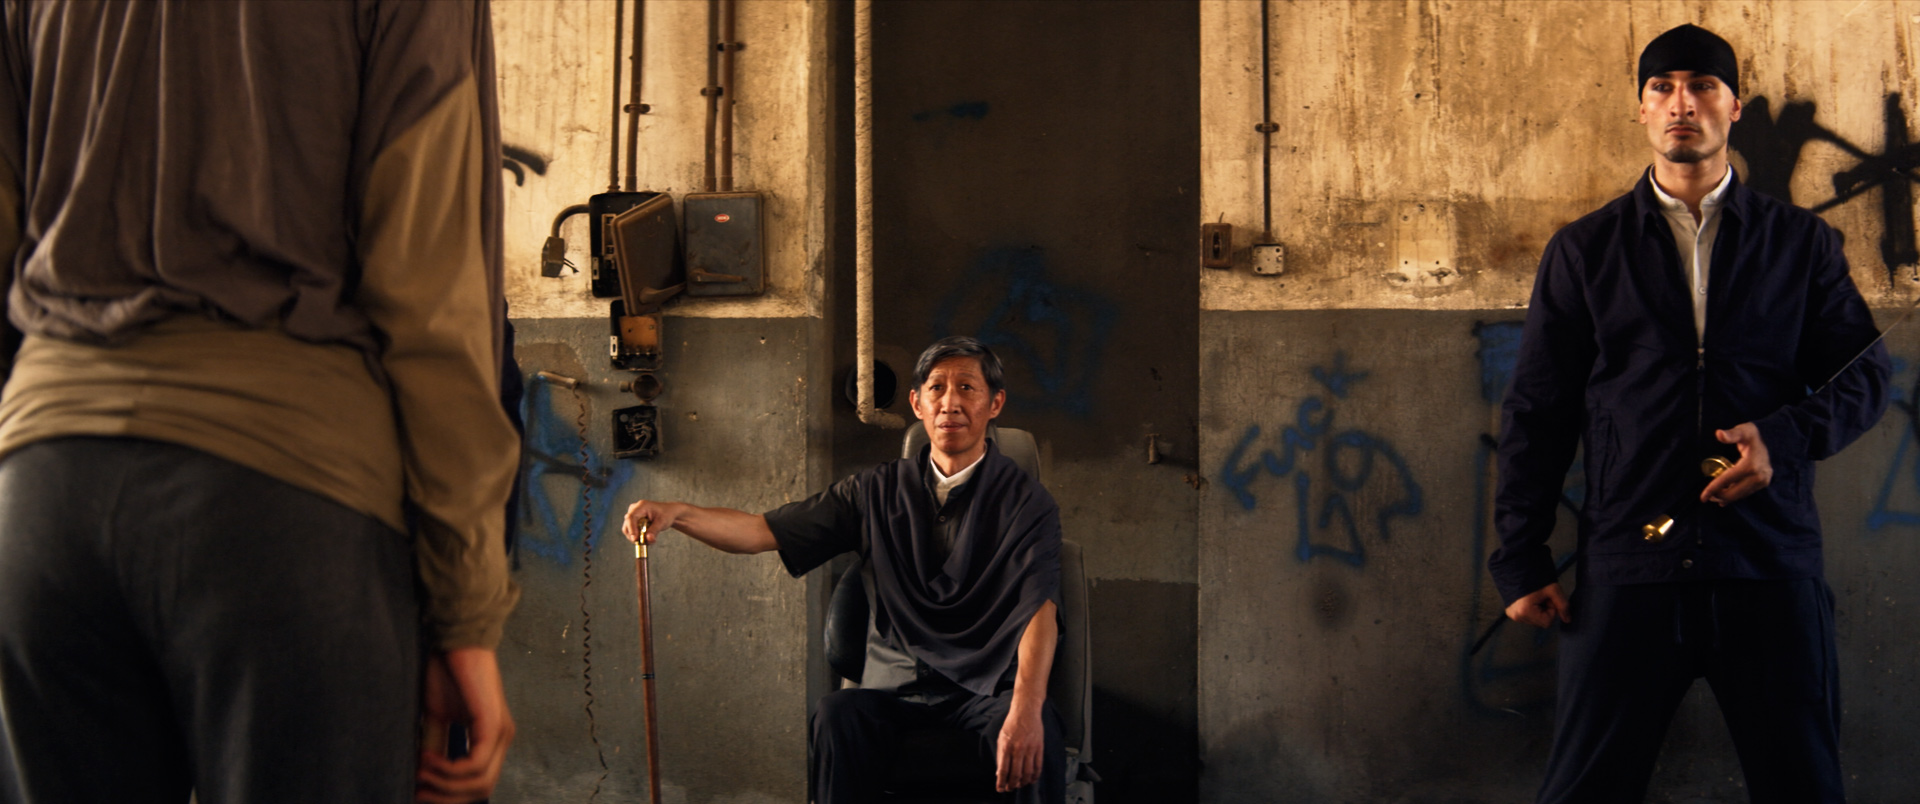 Chinatown - Τα Τρία Καταφύγια / FEATURED